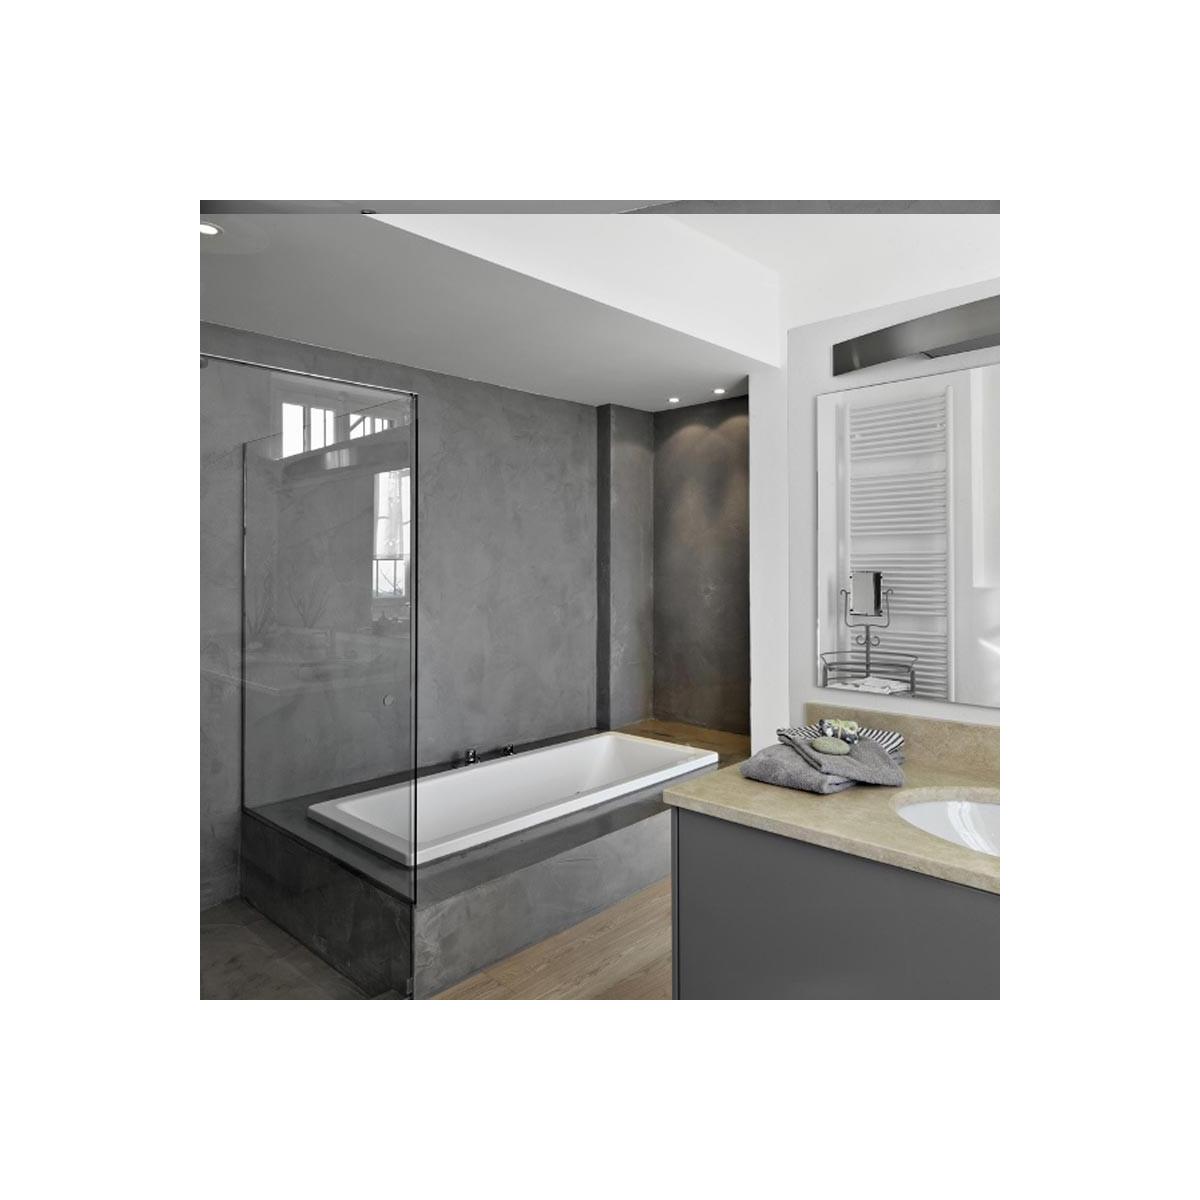 B ton cir salle de bain douche italienne enduit d coratif mural kit - Douche salle de bain ...